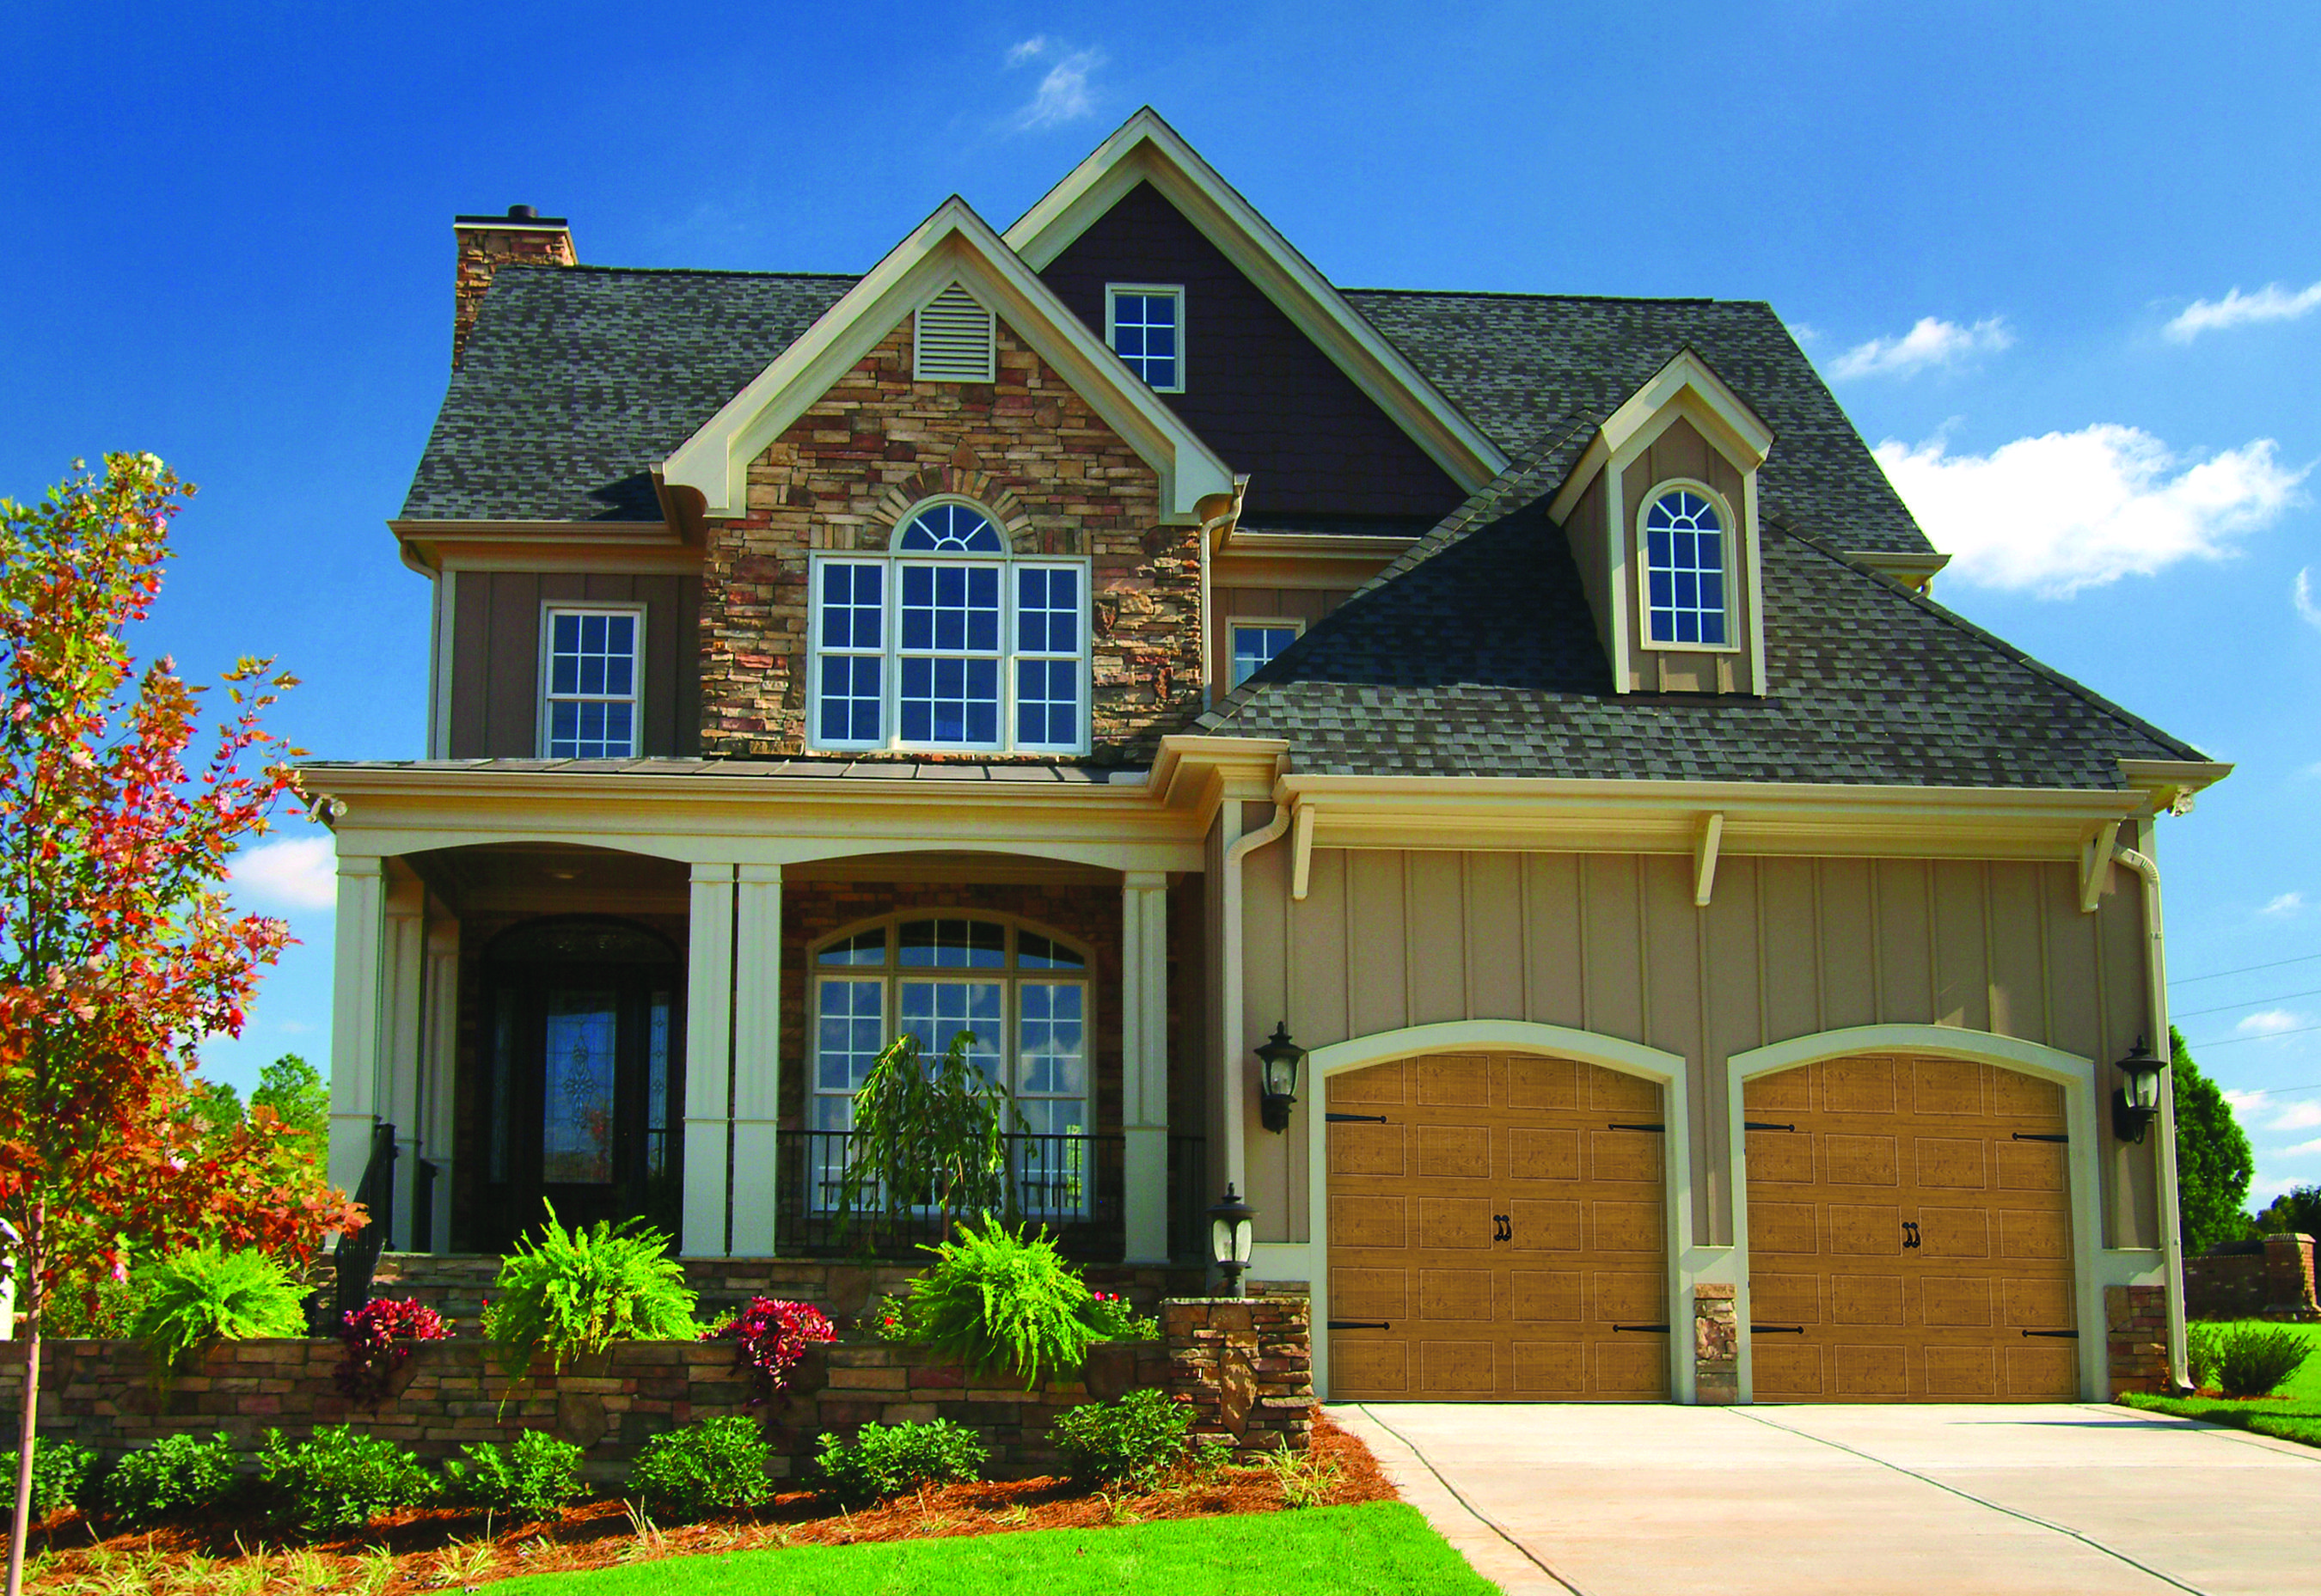 raynor size spring repair of door opener prices large ca orange full garage custom doors